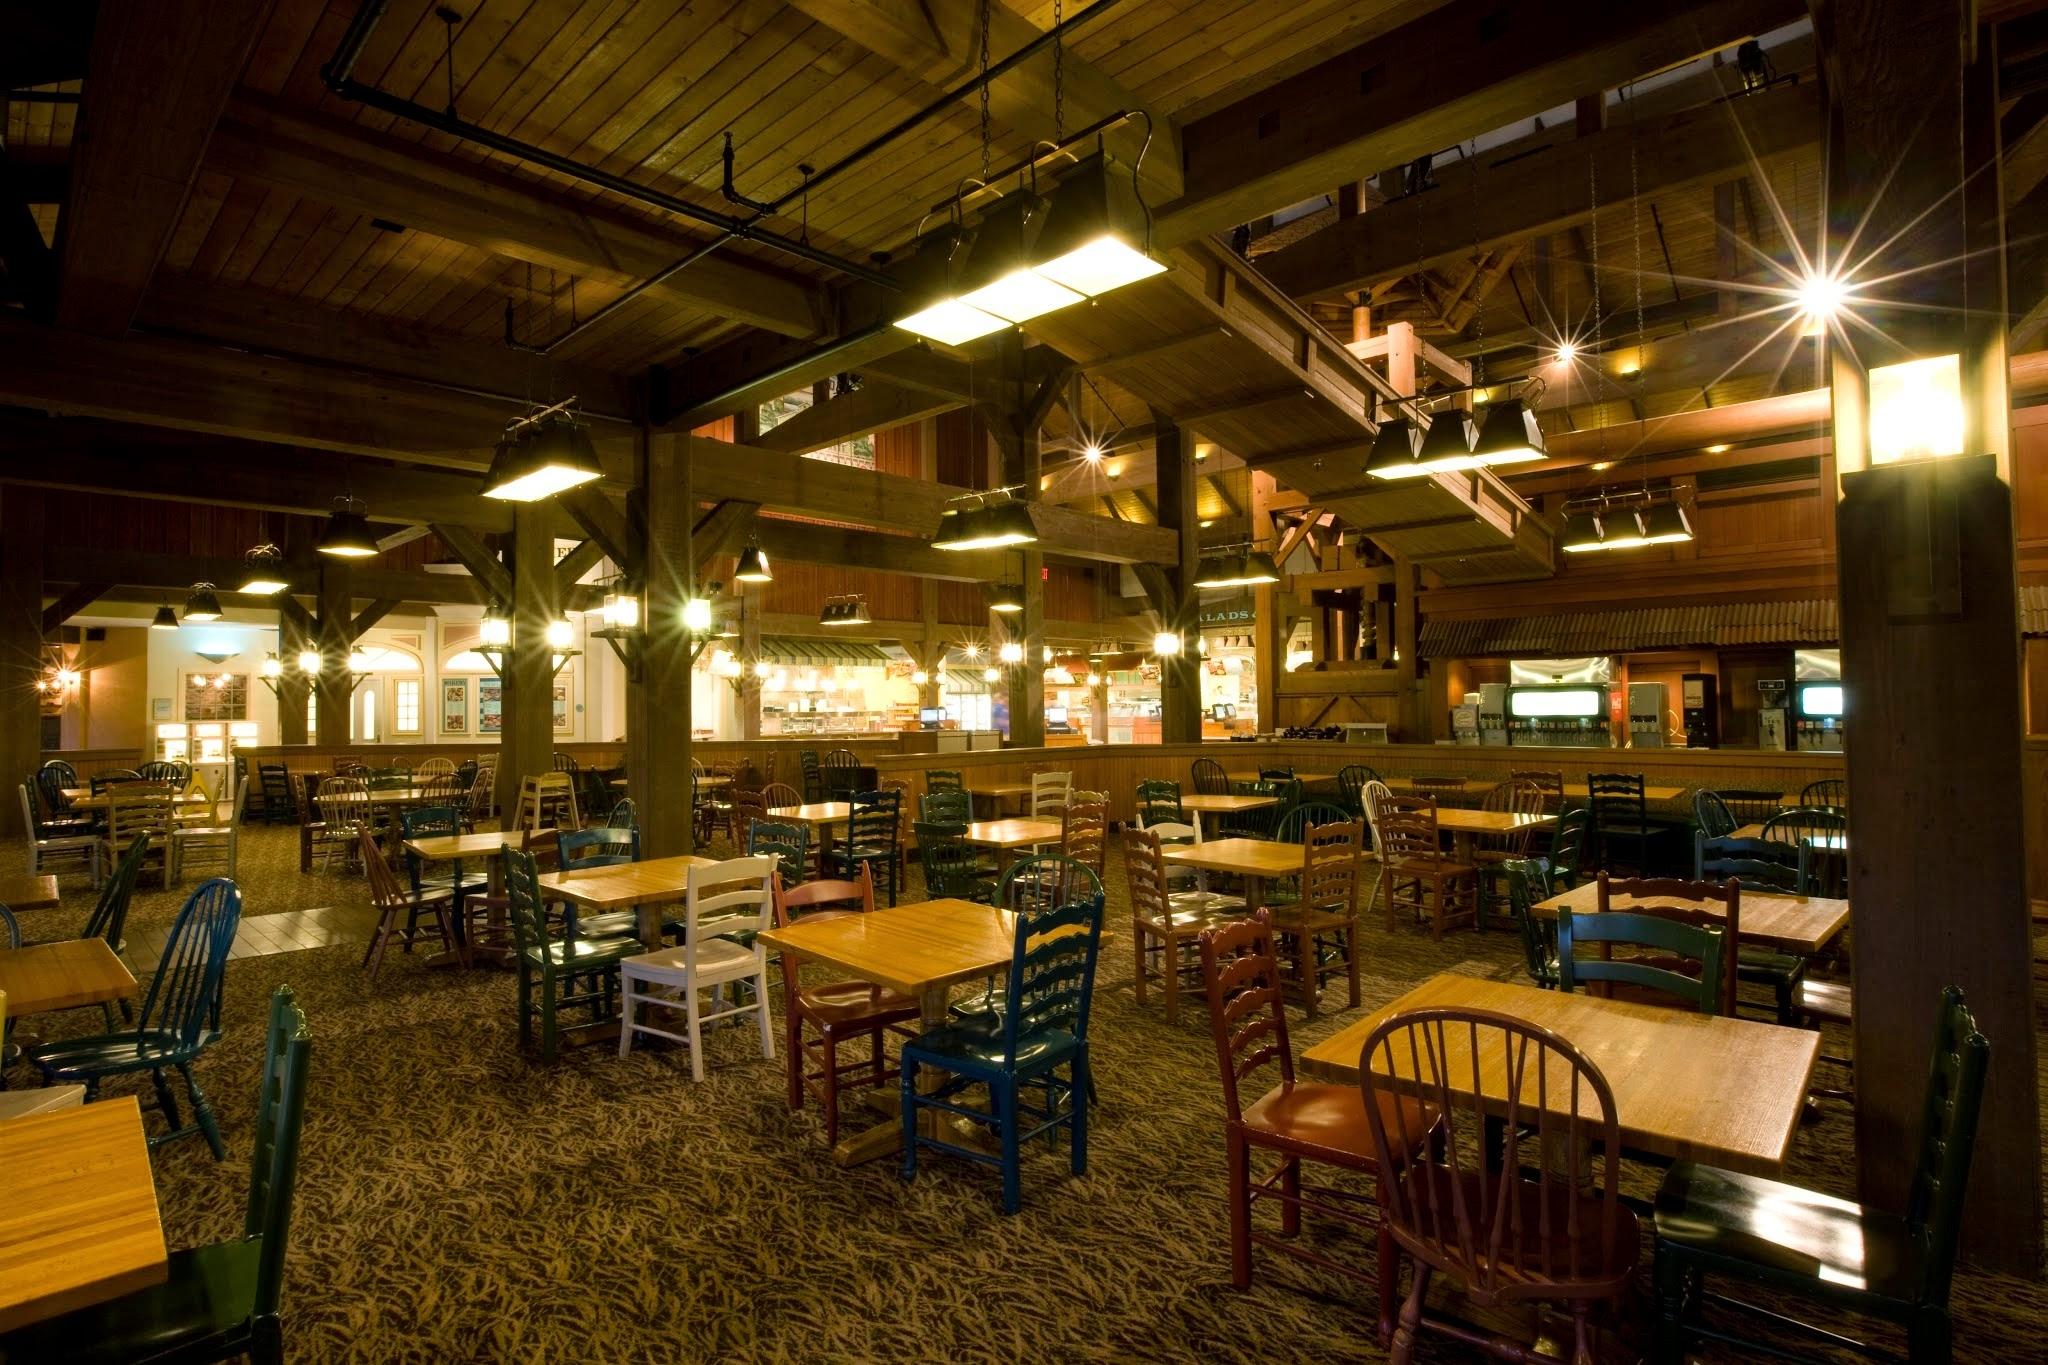 Riverside Mill Food Court image 2